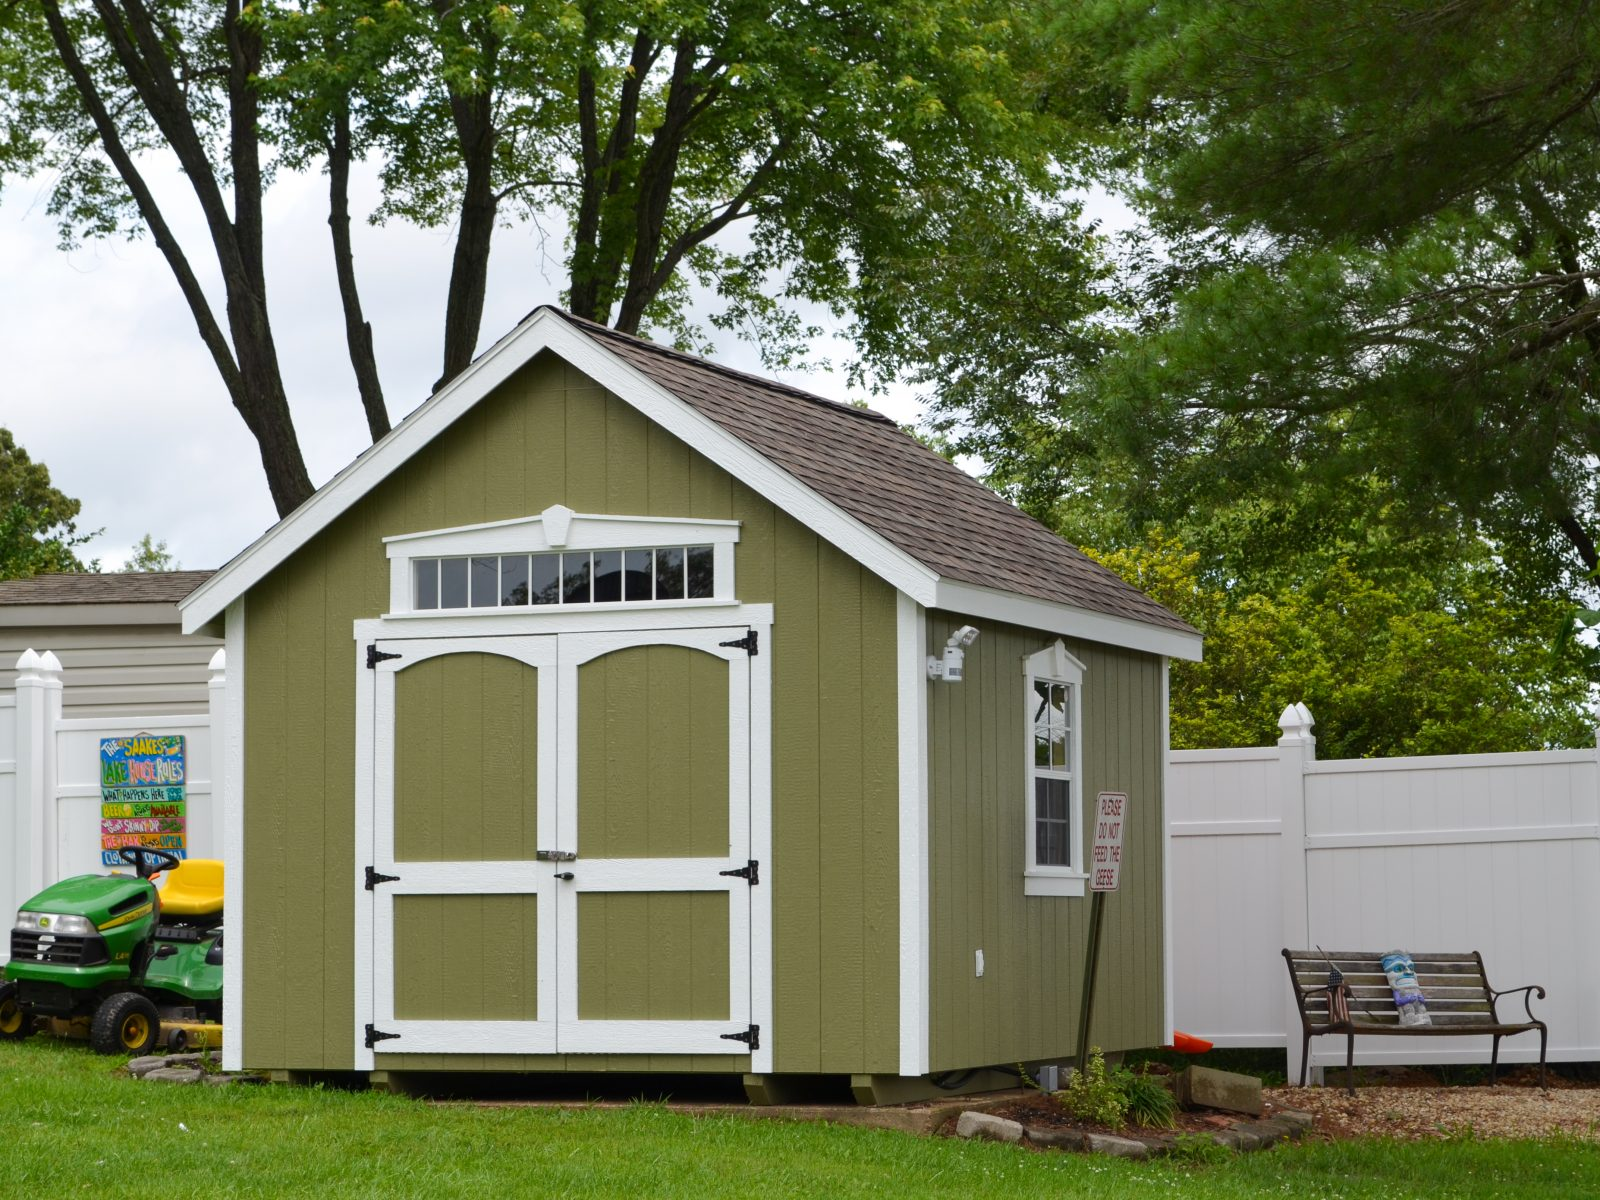 wood shed for sale near fenton missouri